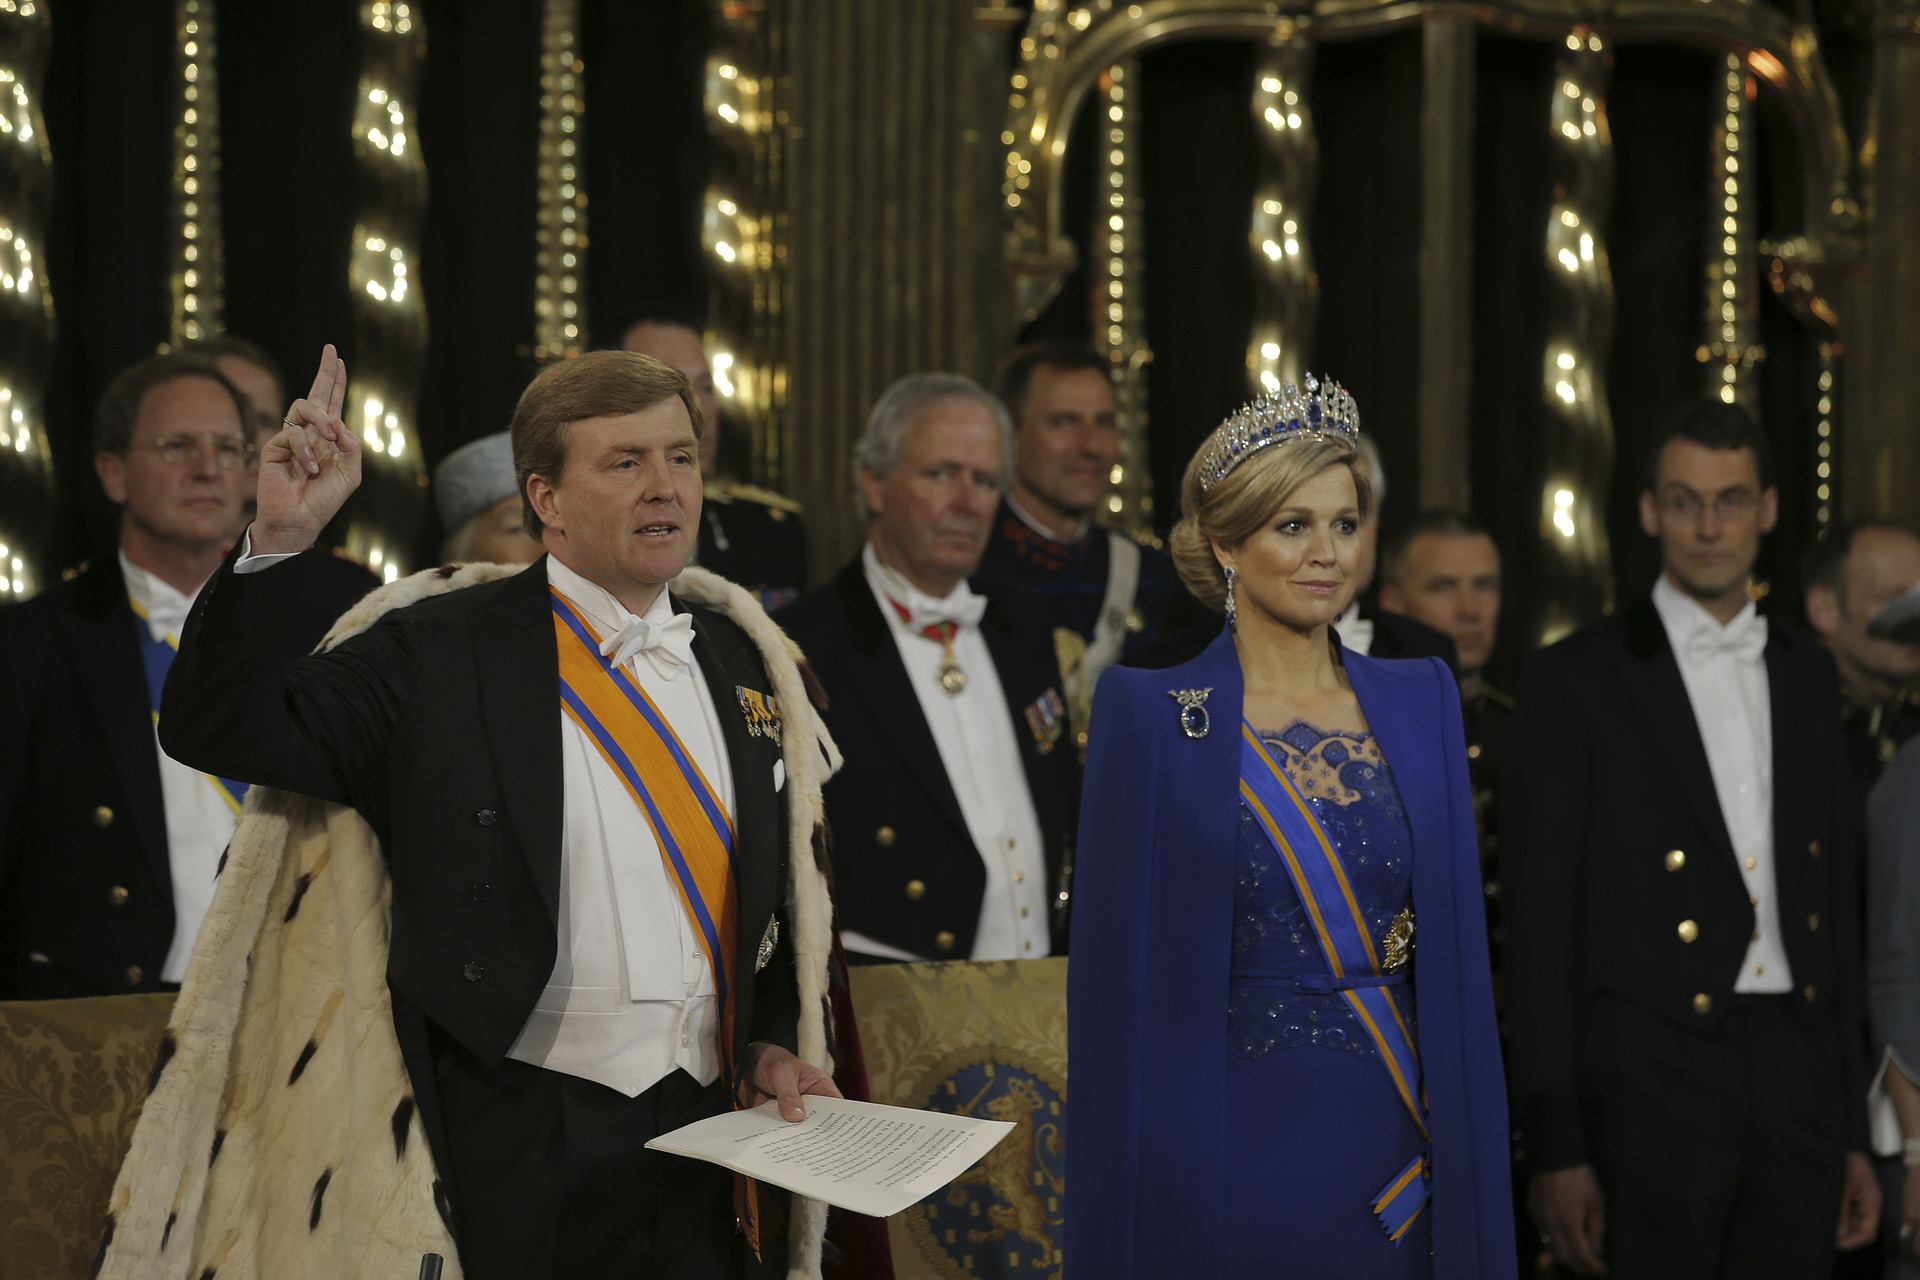 king-willem-alexander-109490_1920